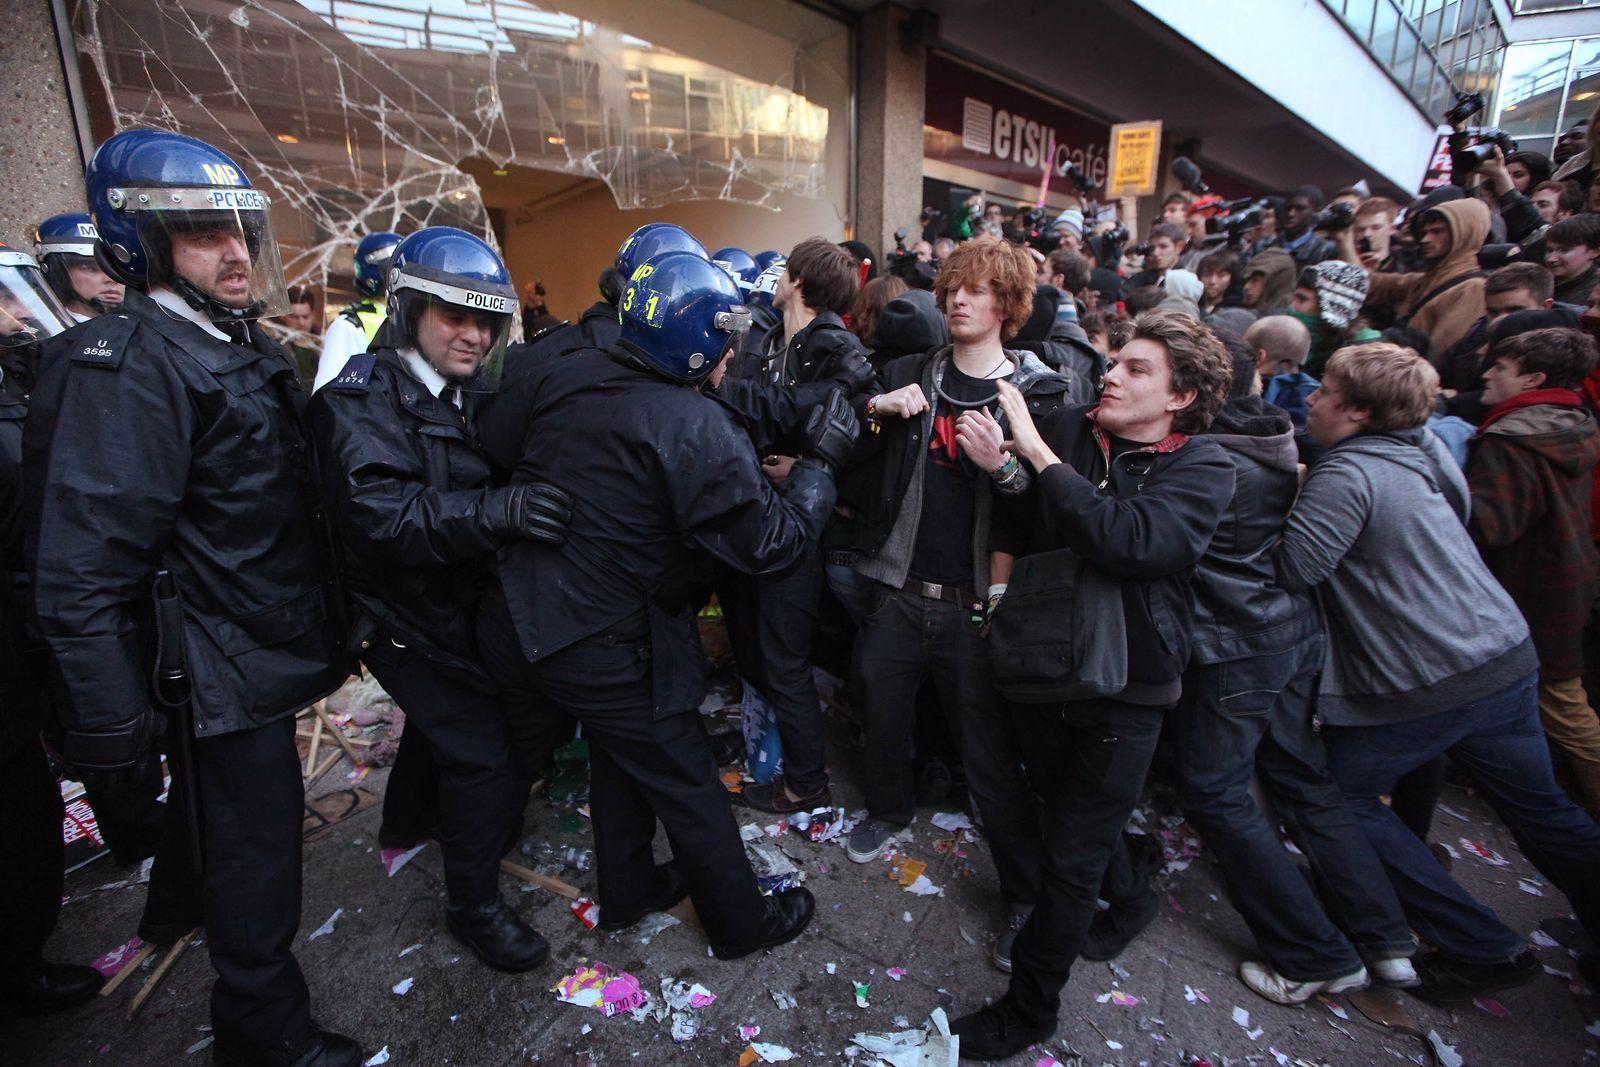 Studentenproteste London